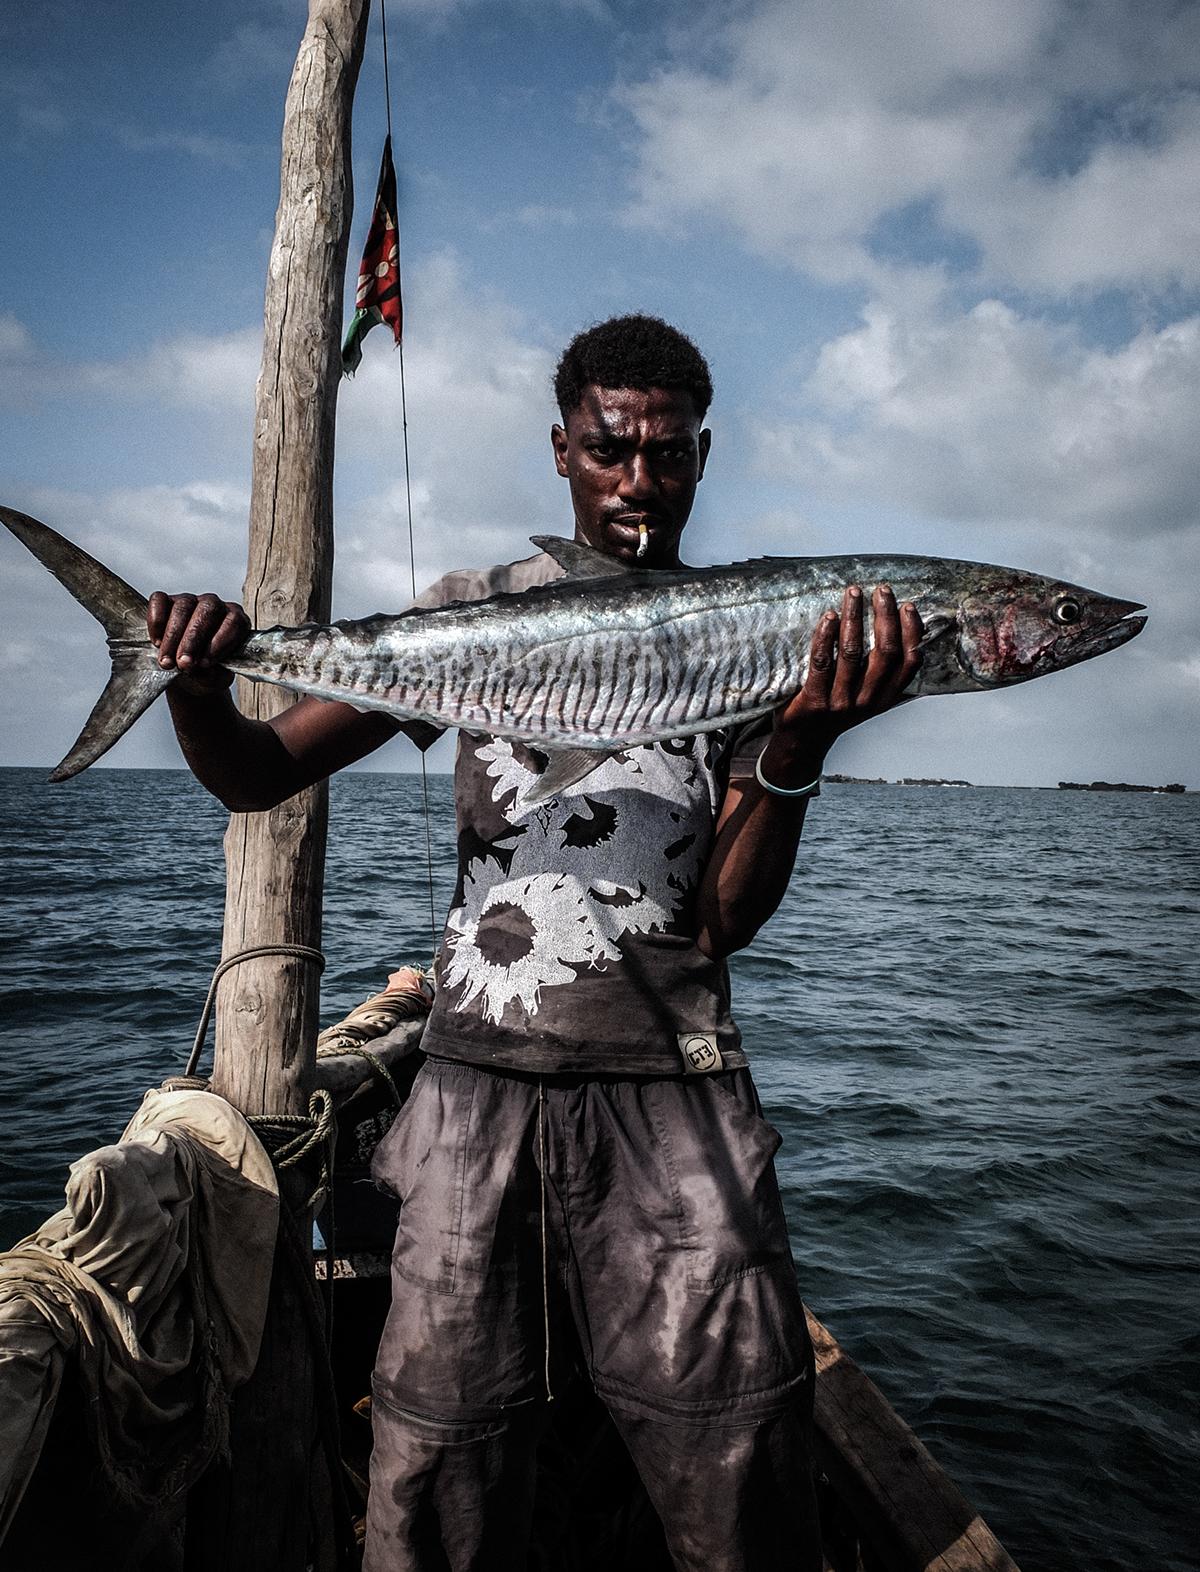 africa fish sea fishing Fisherman fishermen Swahili kenya Documentary  Work  african man men life adventure